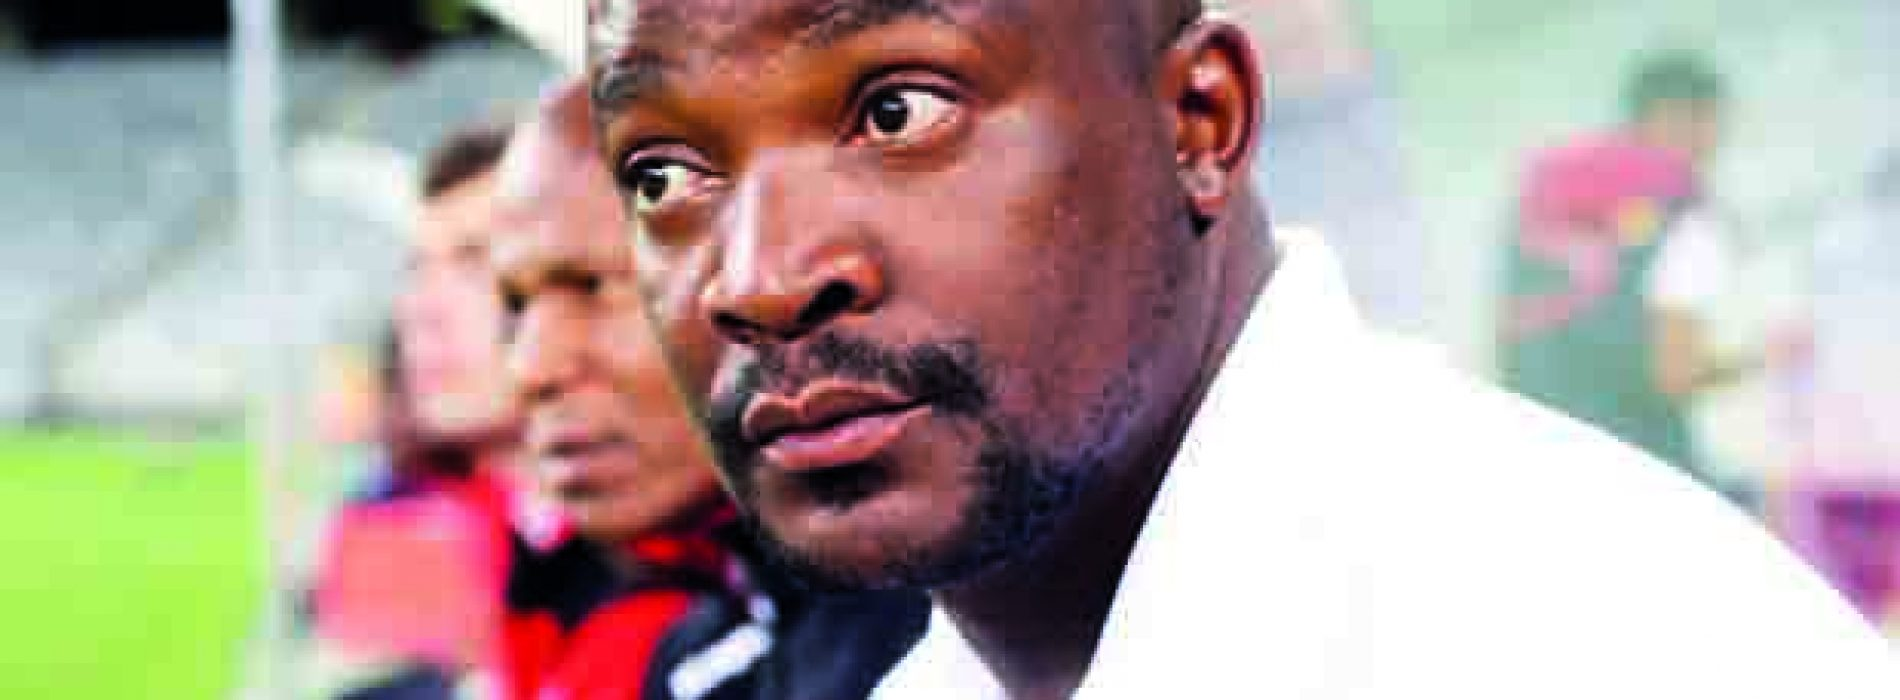 Bantu duo may join Chippa United